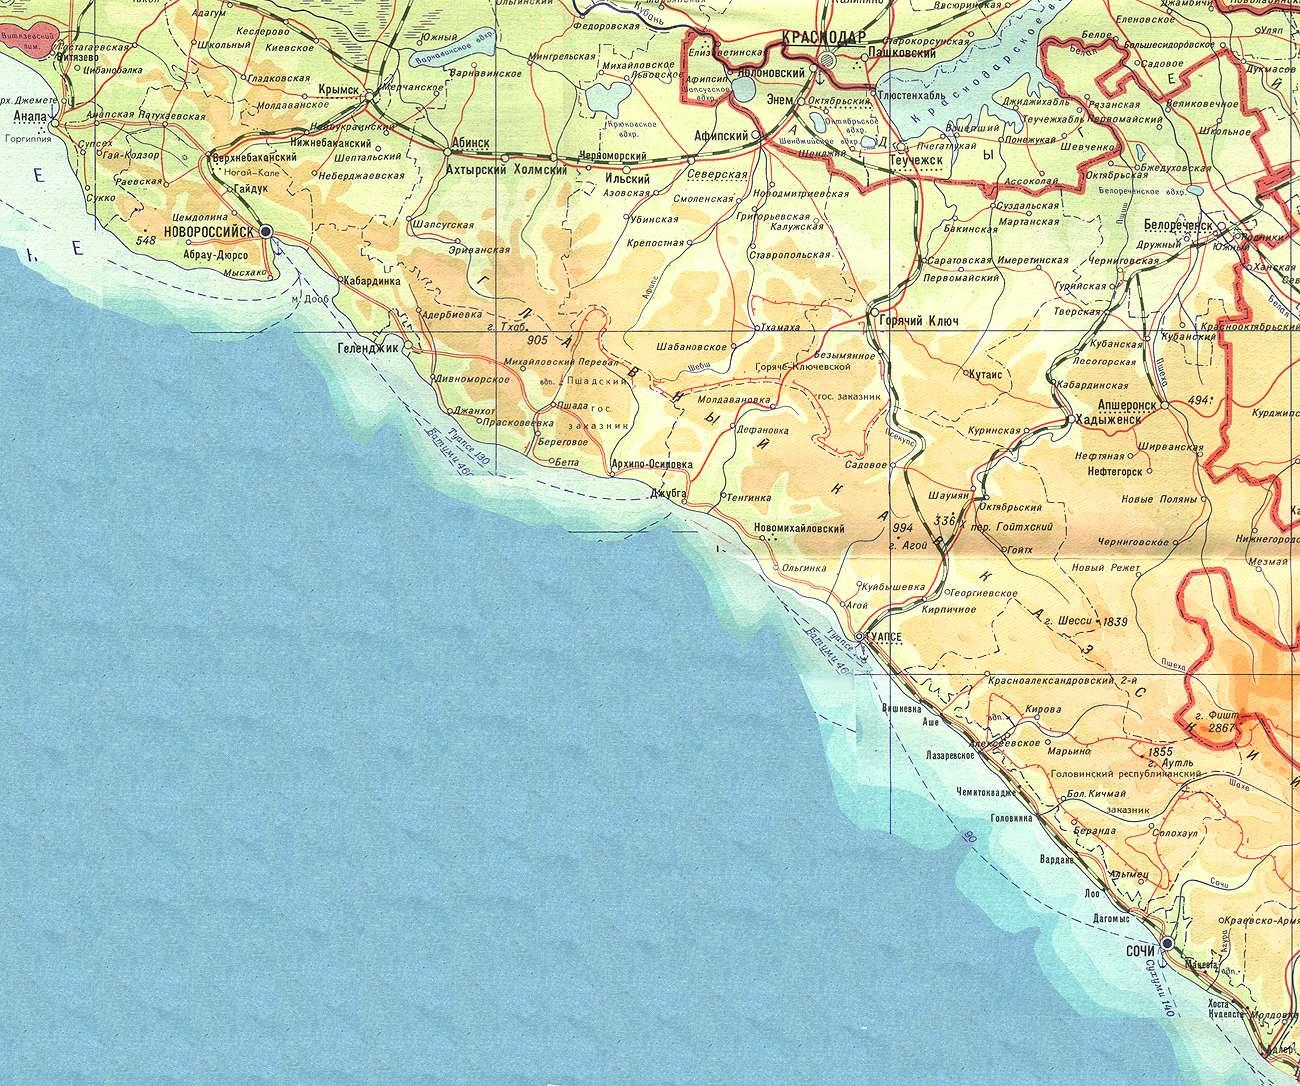 Карта побережья черного моря